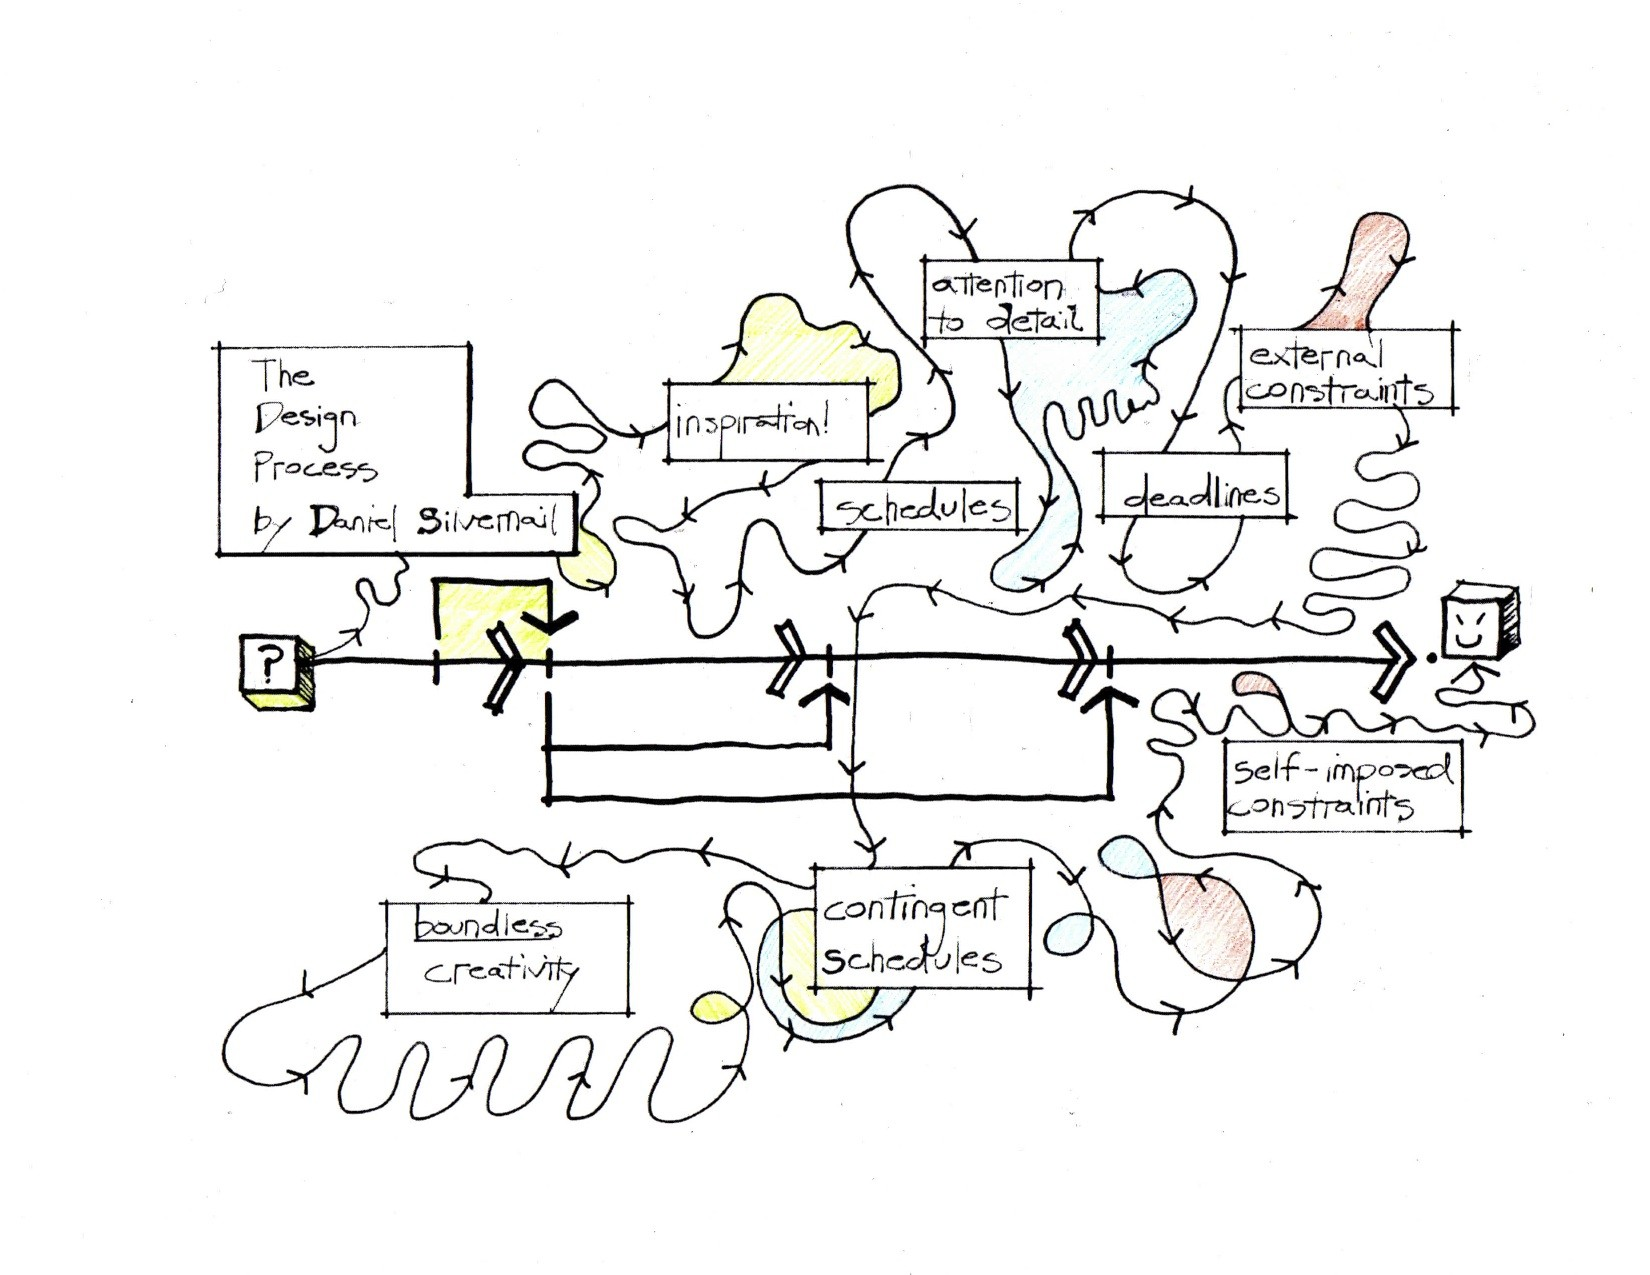 The Design Process Santacruzarchitect Wordpress Com